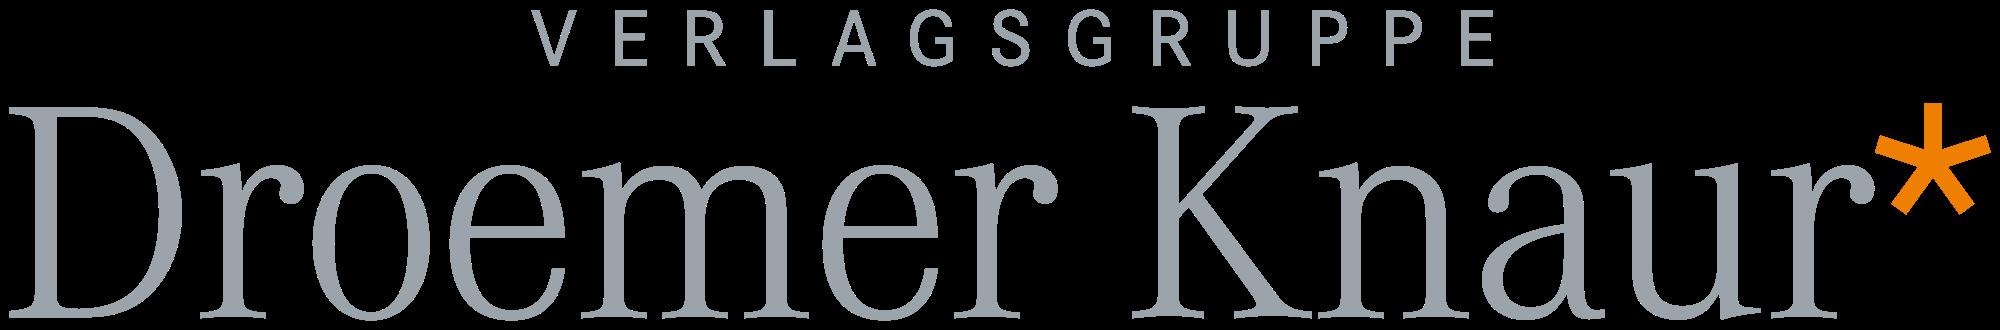 Droemer_Knaur_logo.png